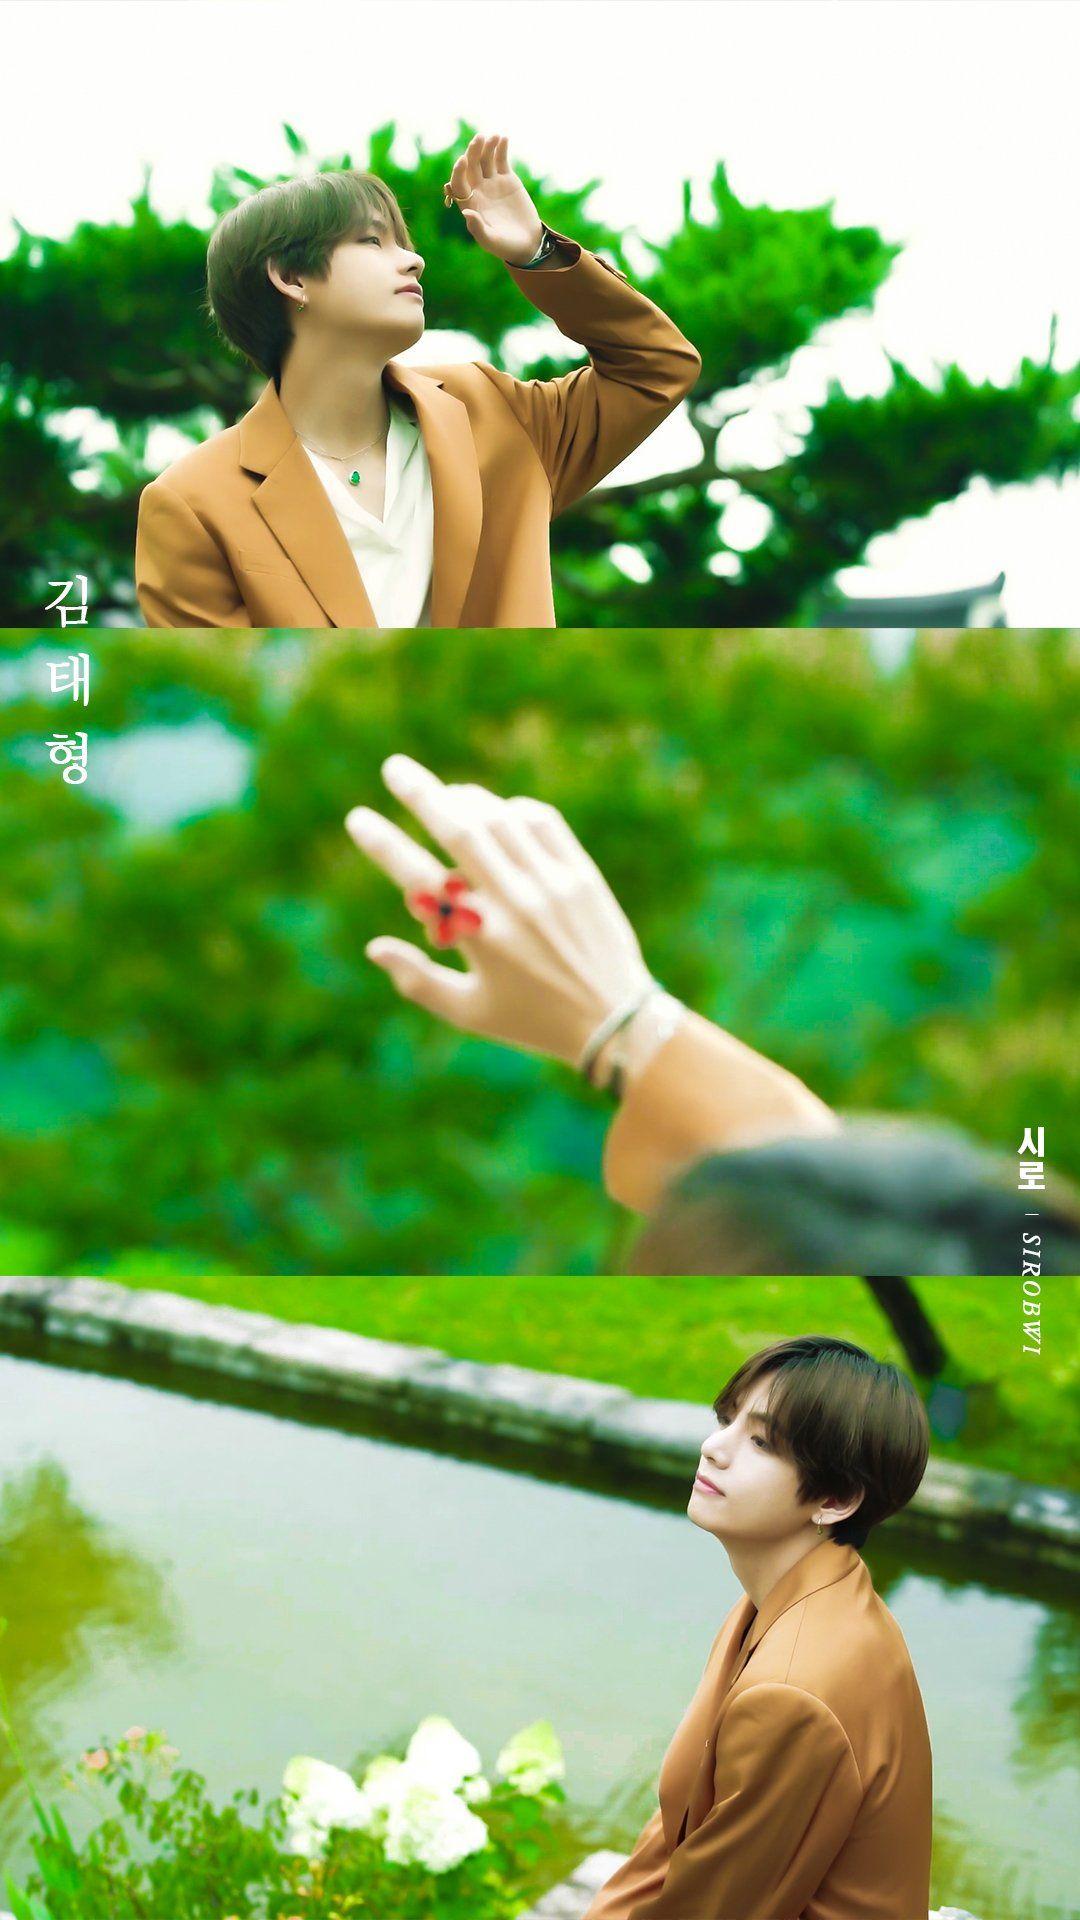 [PREVIEW] BTS (방탄소년단) 'BTS 2019 SUMMER PACKAGE in KOREA' BTS Wallpaper Lockscreen & Edit #bts #jk #v #jimin #jhope #suga #jin #rm #btssummerpackage2019